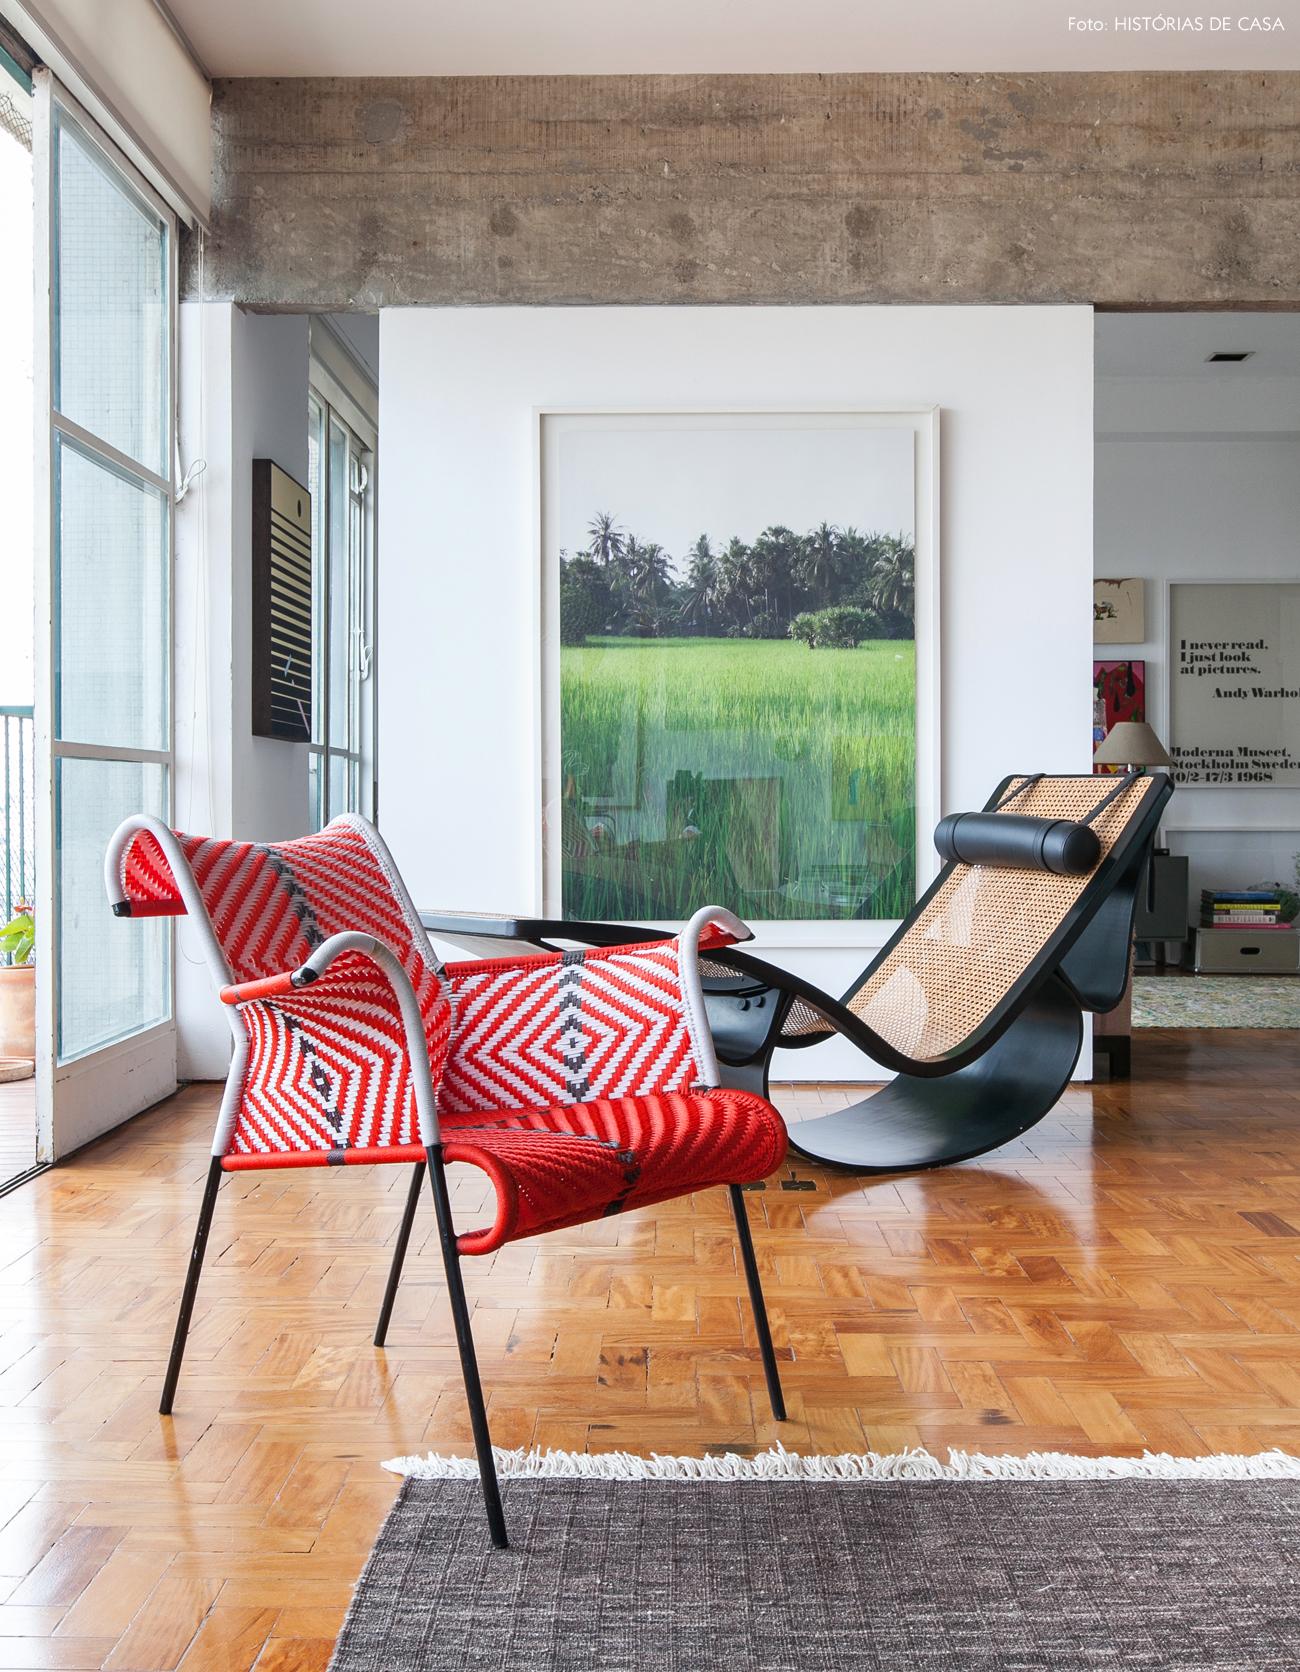 06-decoracao-sala-integrada-concreto-chaise-oscar-niemeyer